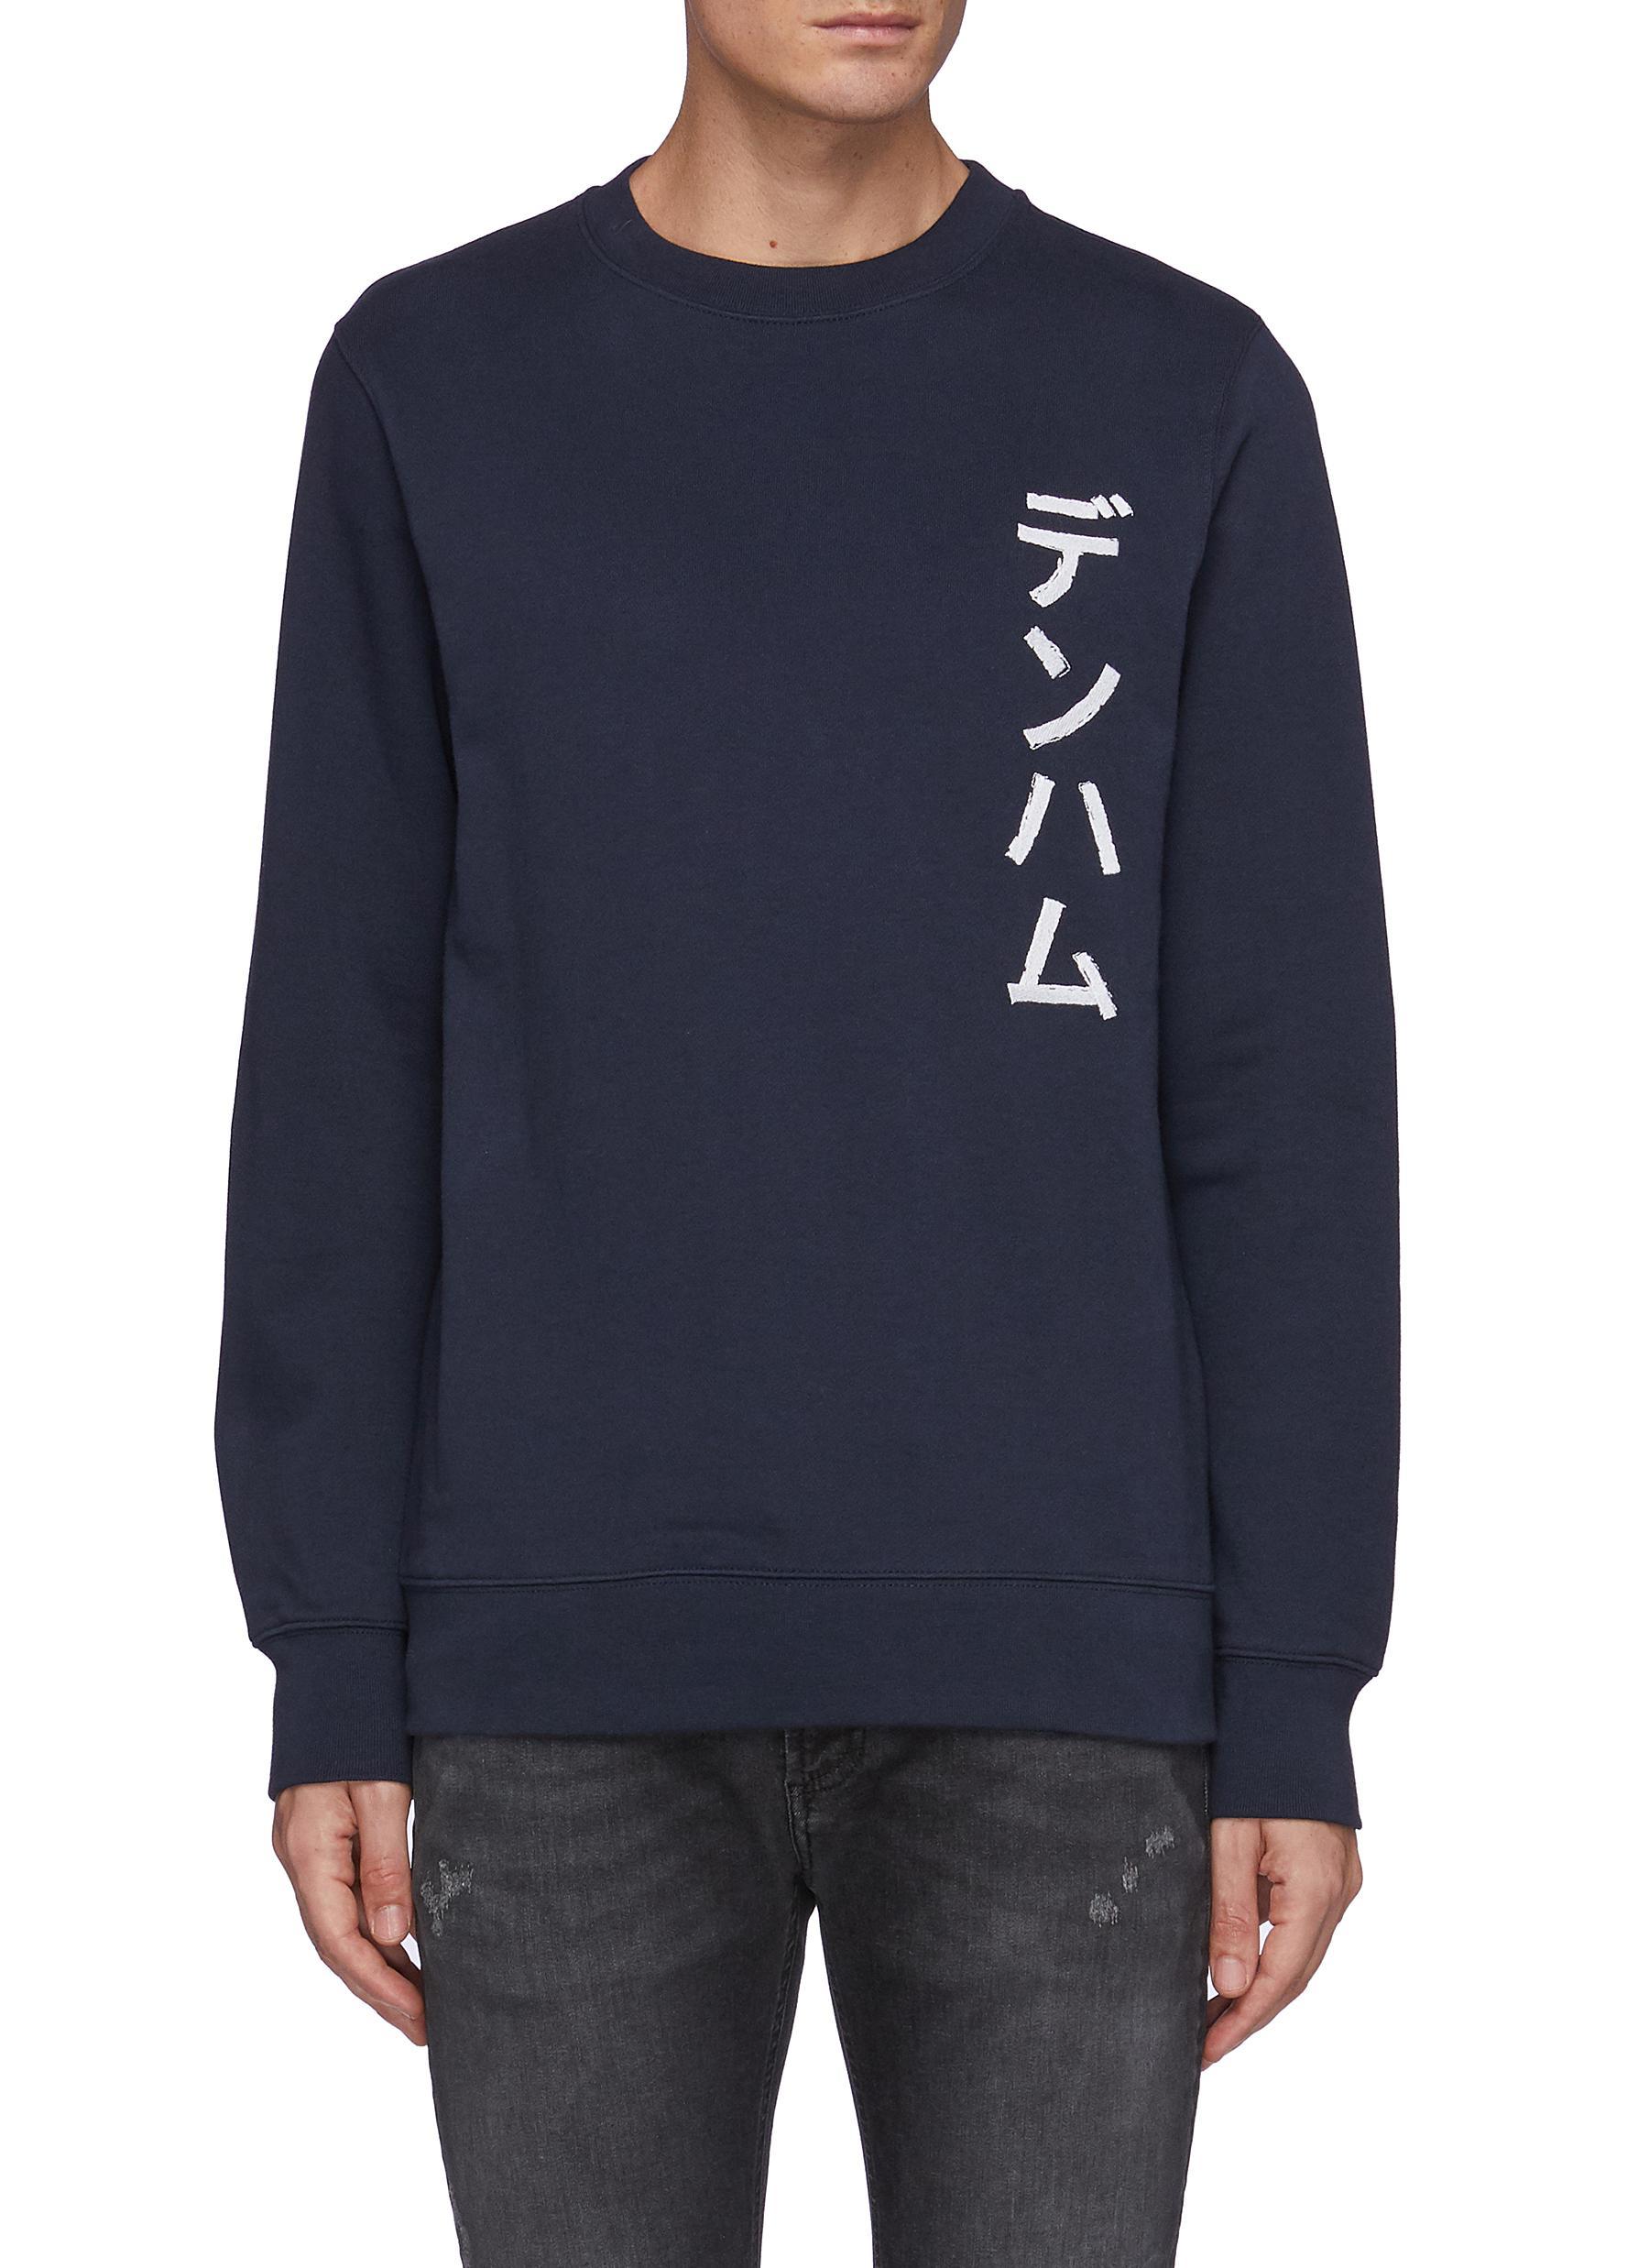 Japanese Font Branded Cotton Sweatshirt